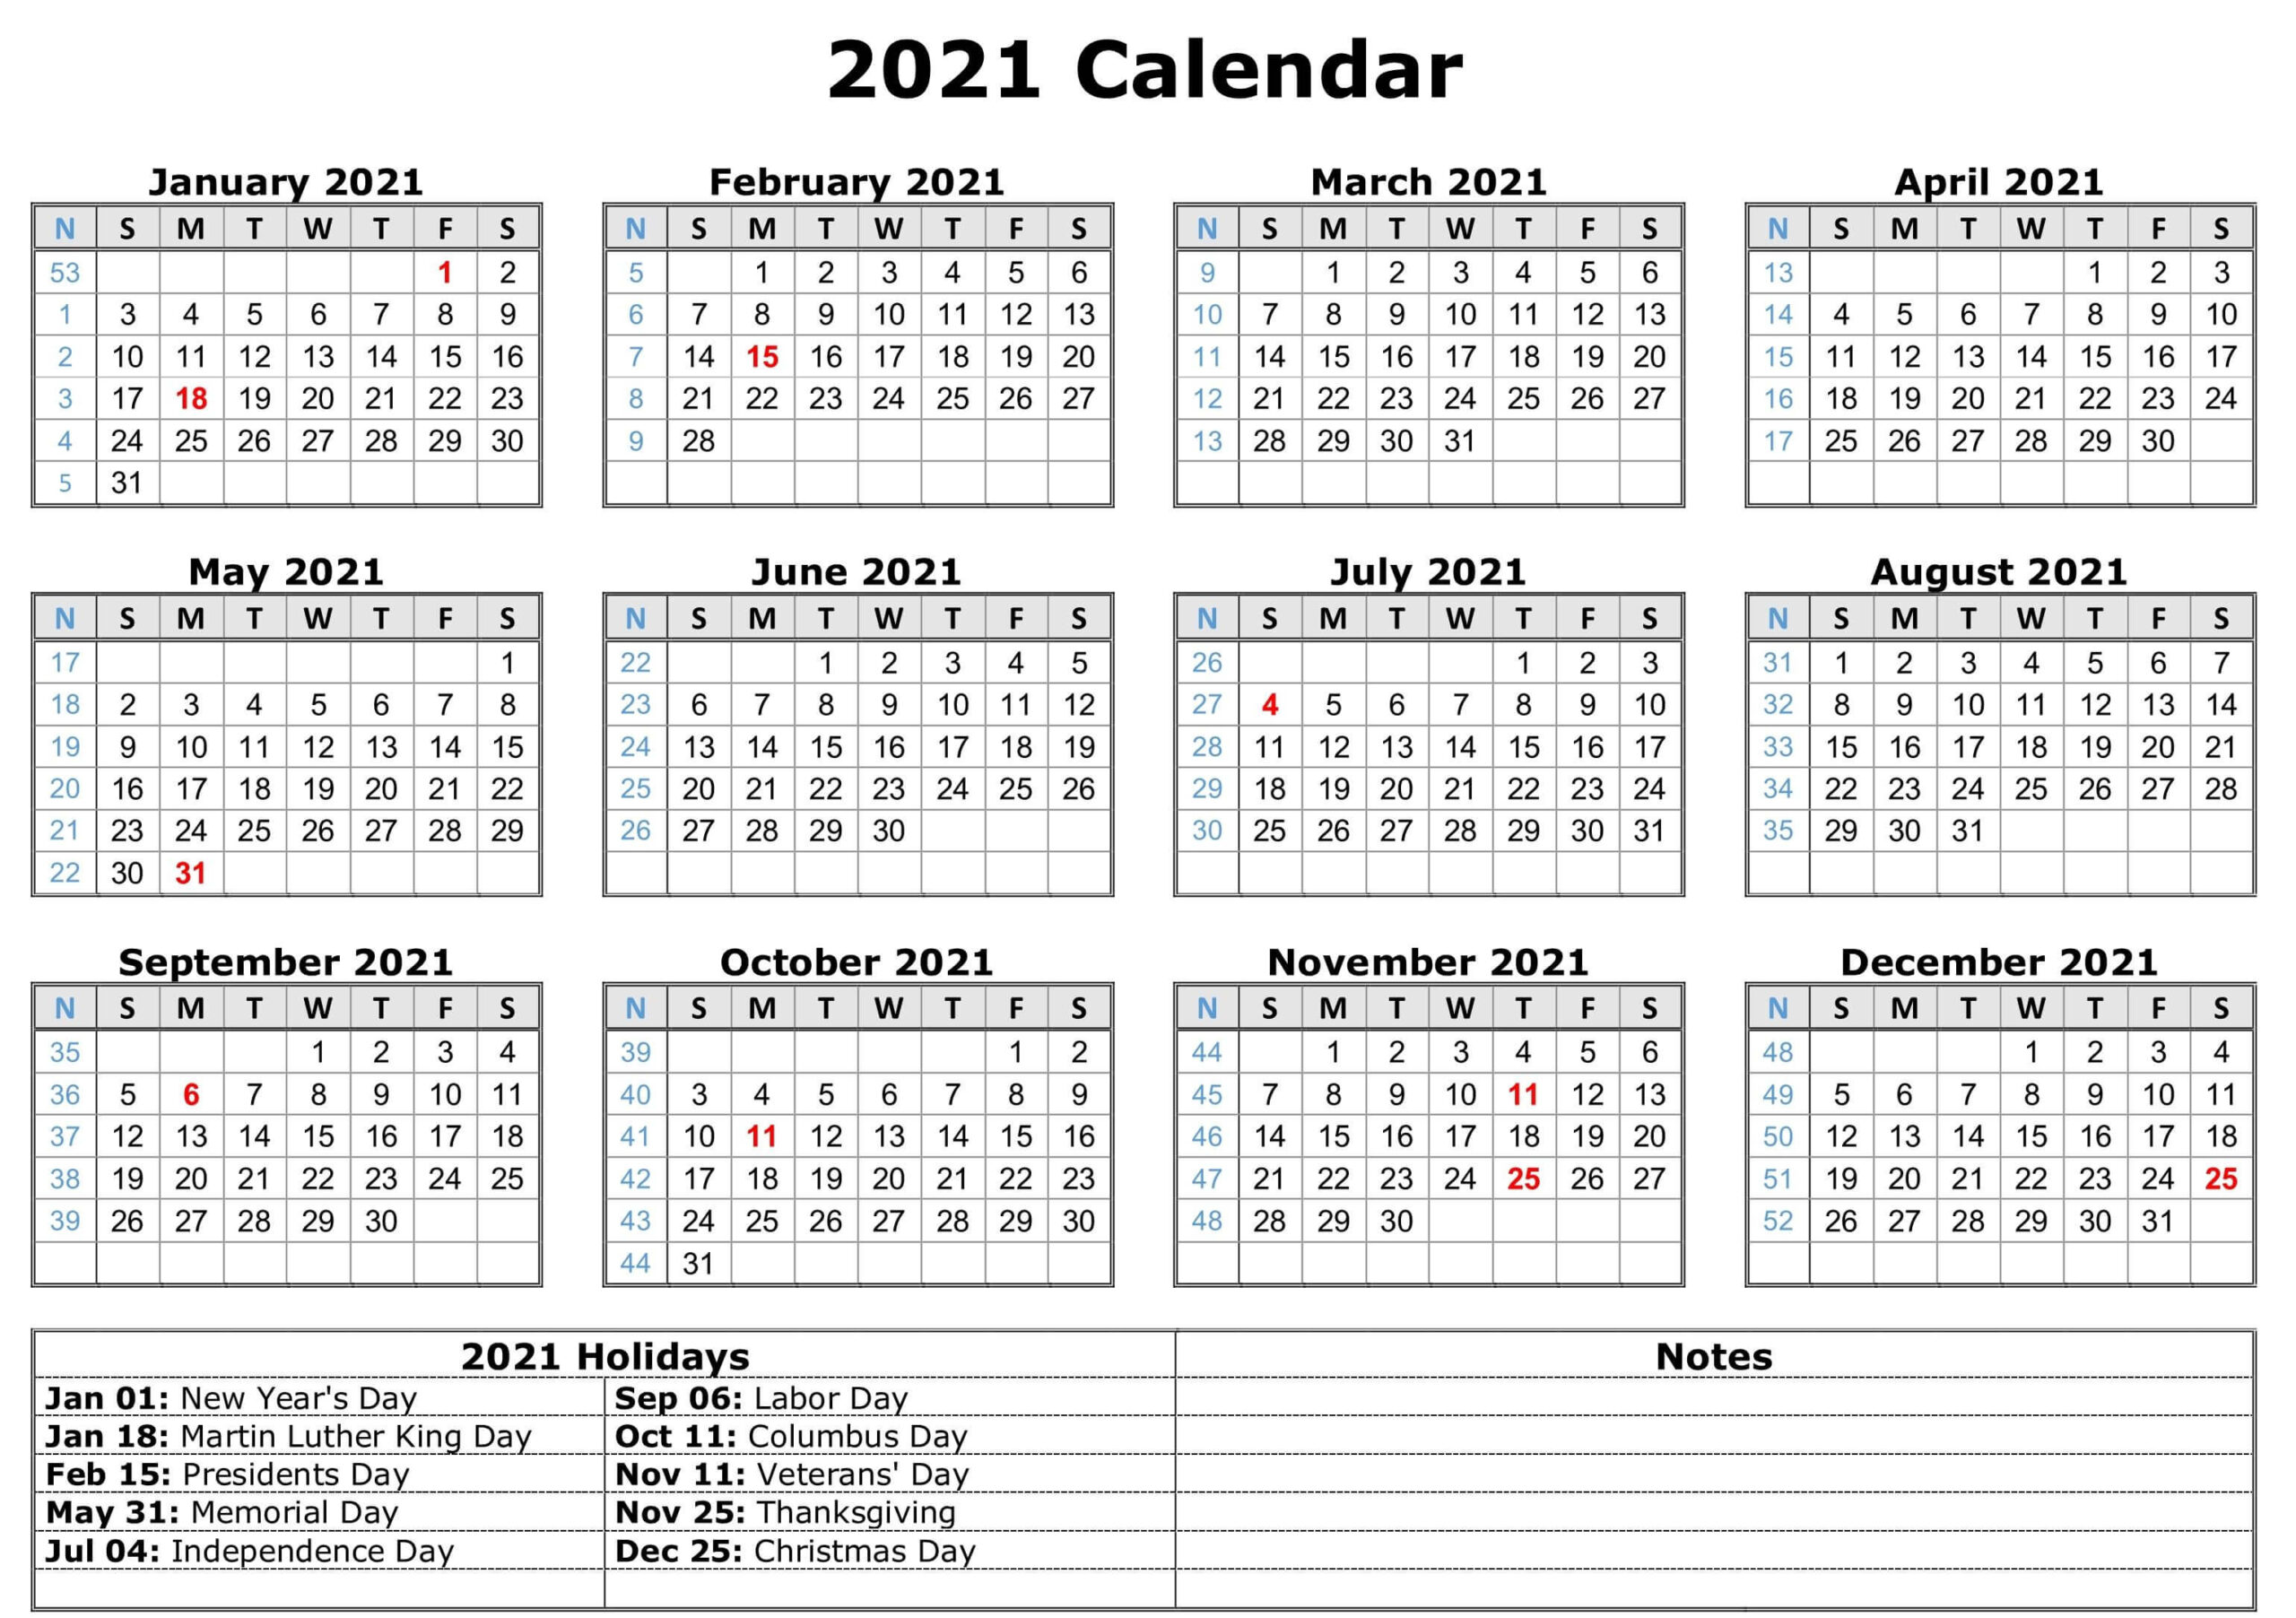 Free Blank Monthly 2021 Printable Calendar Template-Fillable Calendar 2021-2021 Year